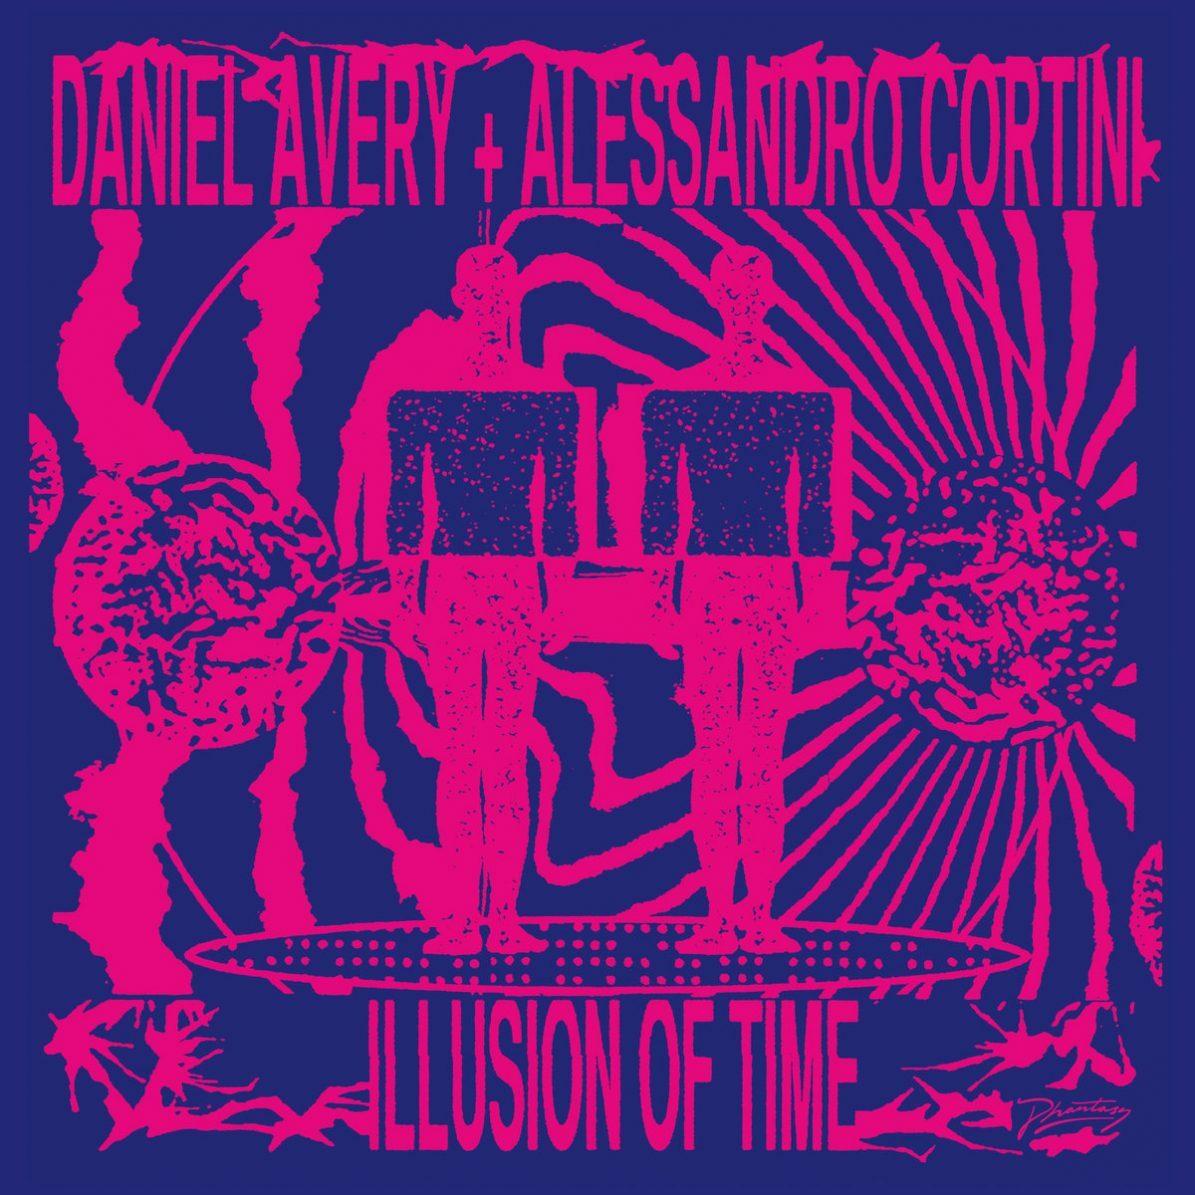 Daniel Avery & Alessandro Cortini – Illusion Of Time (Phantasy Sound, 2020)